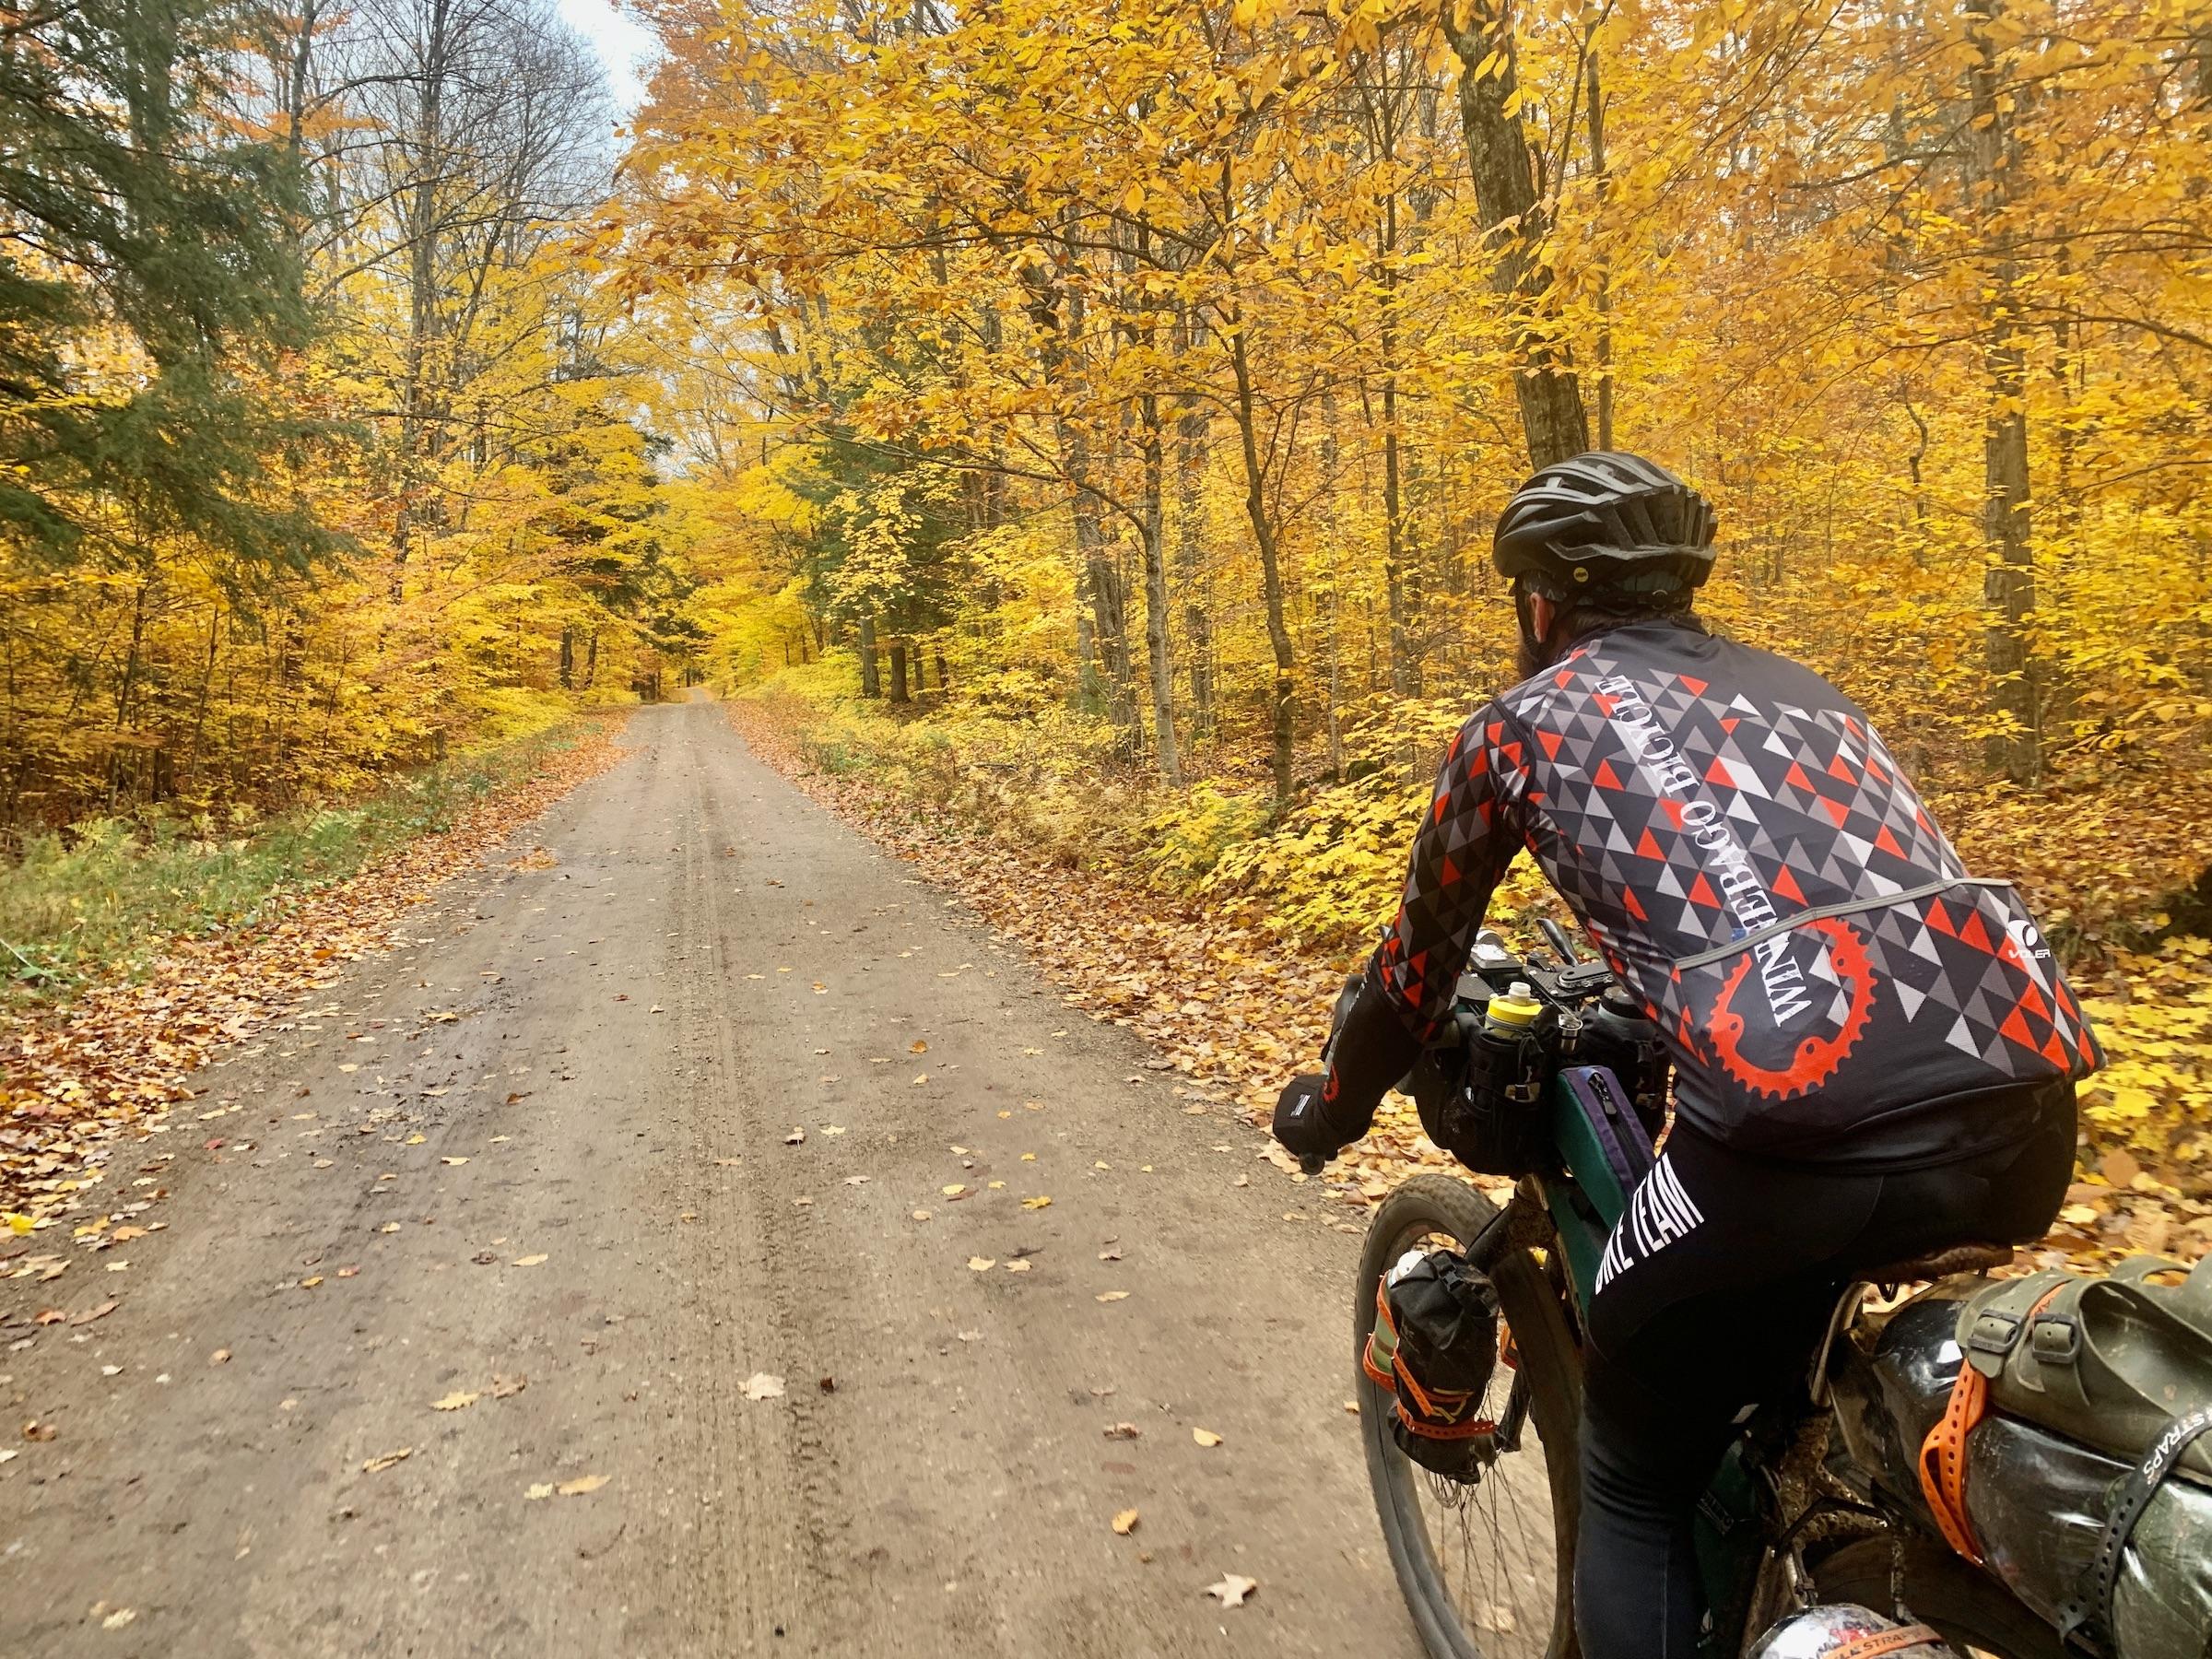 project adventrus bike ride through fall colors